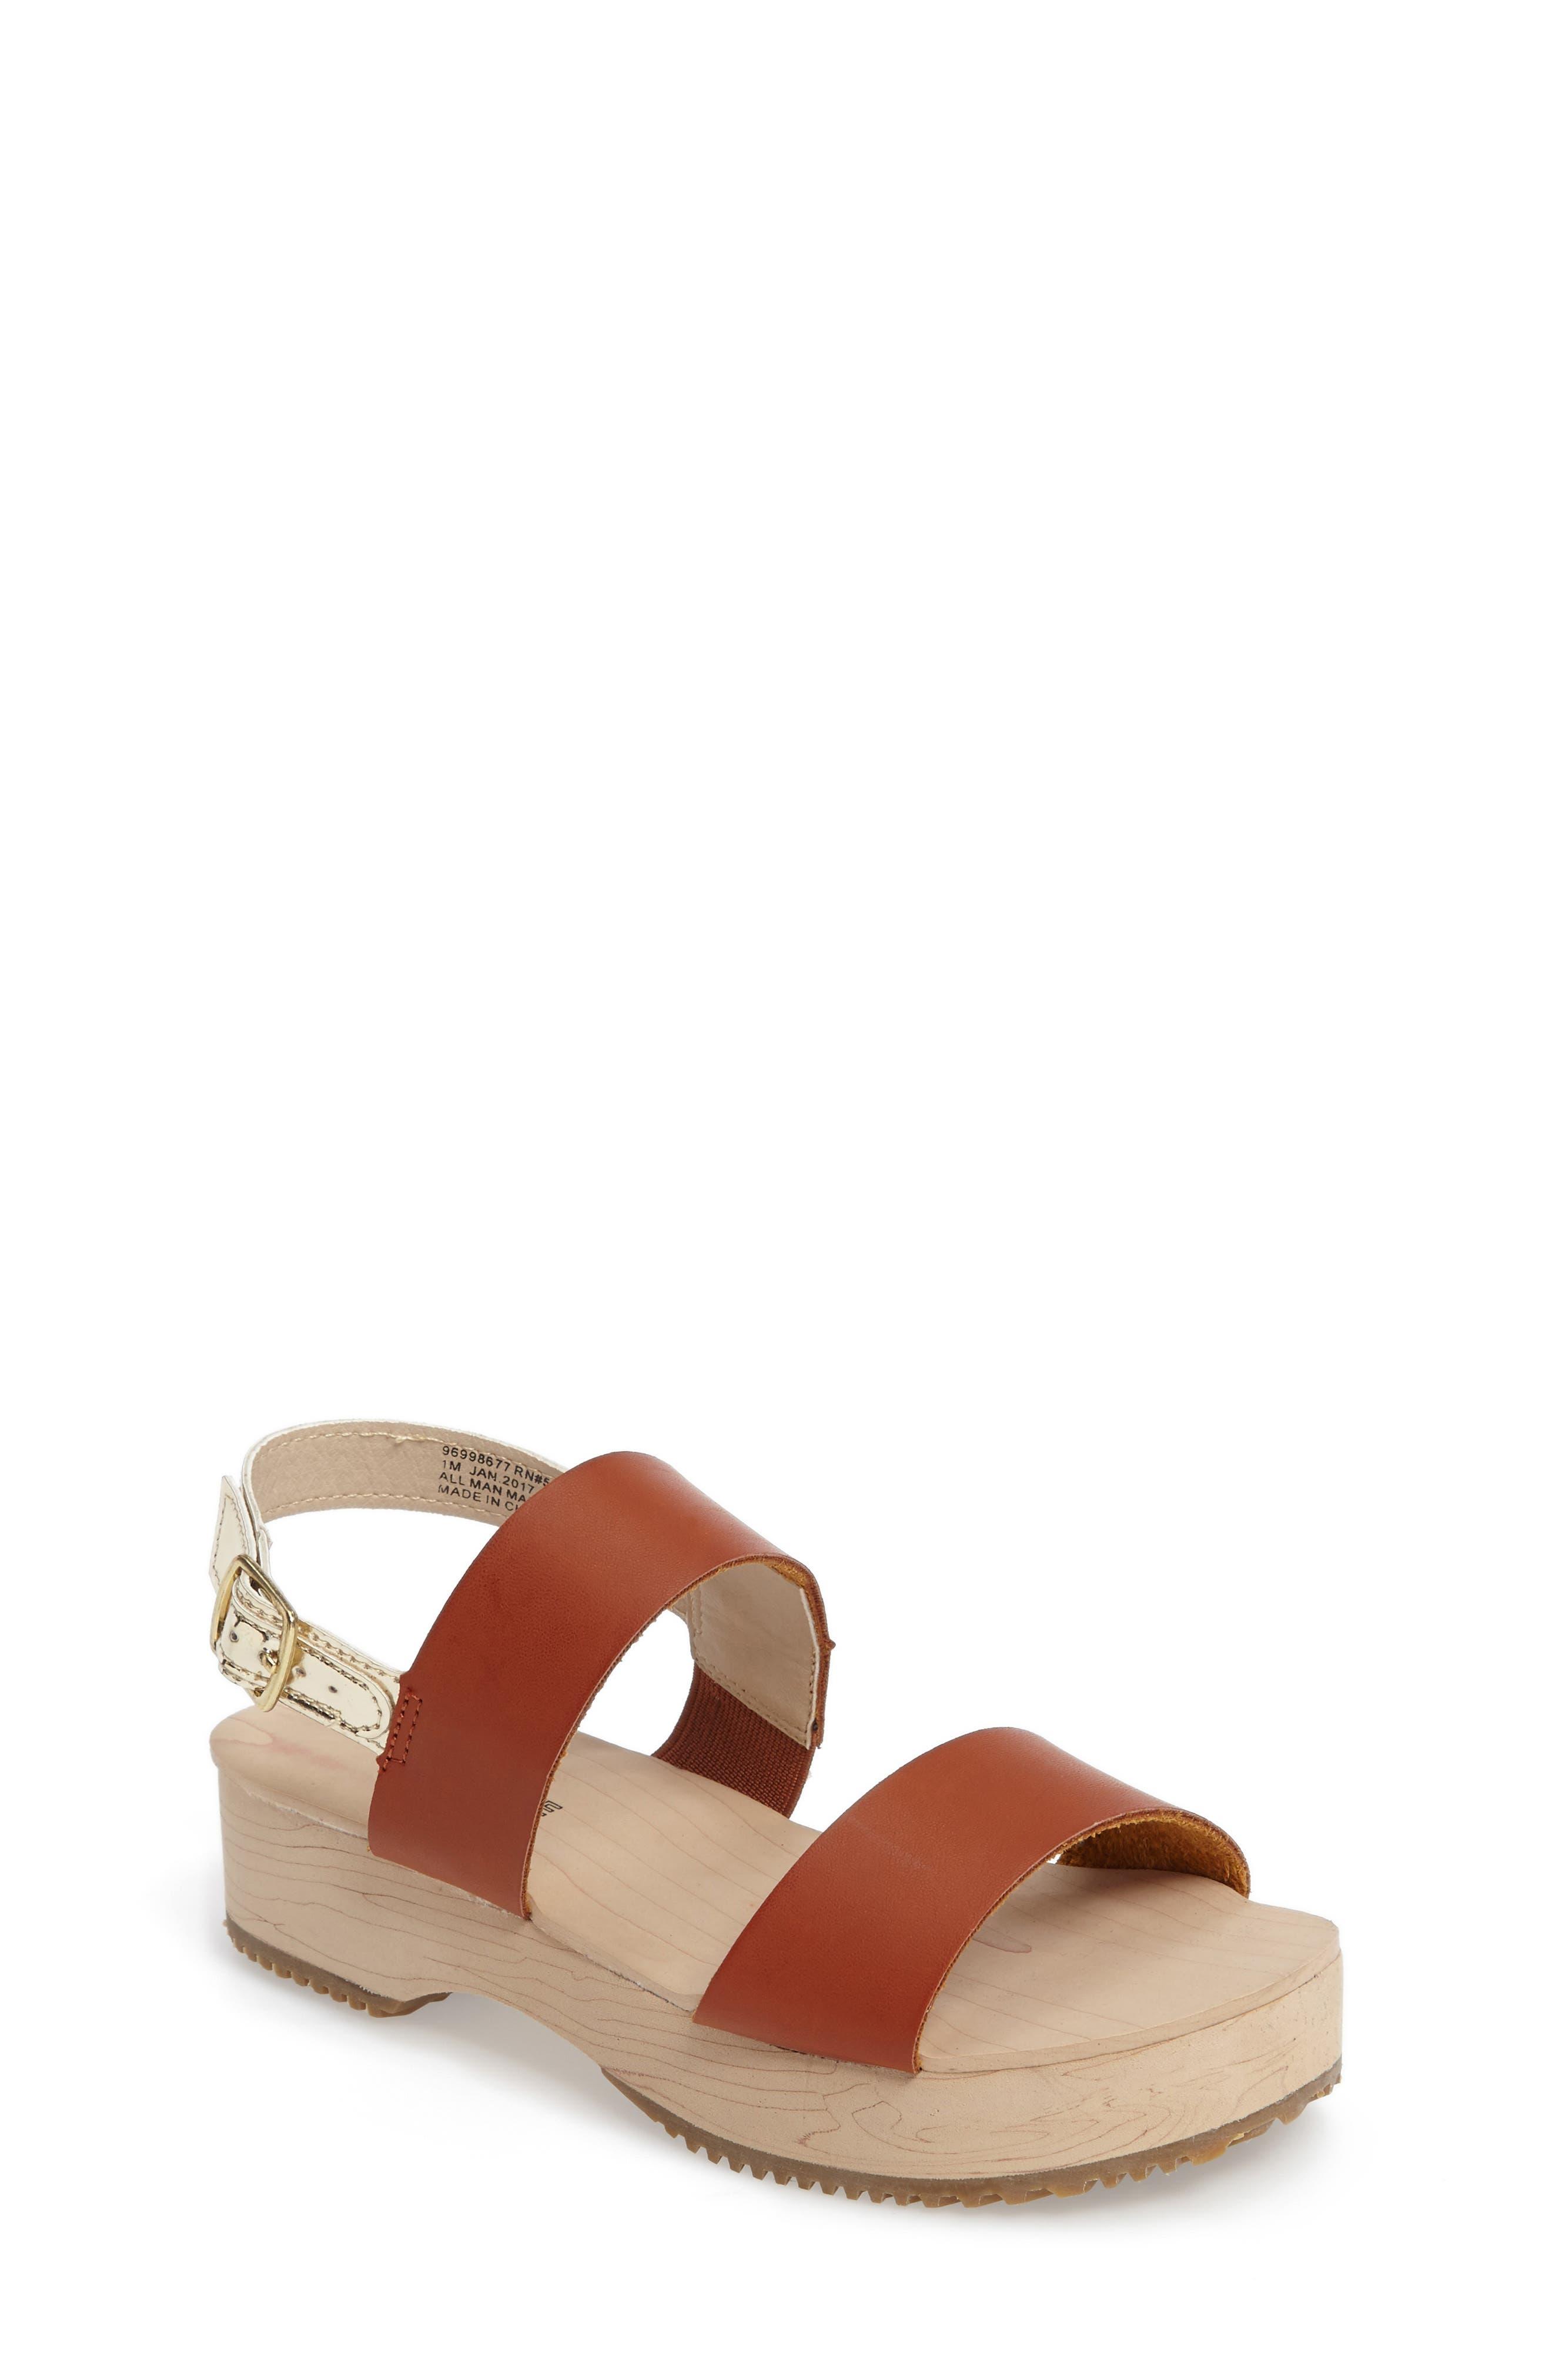 TUCKER + TATE Isabel Platform Sandal